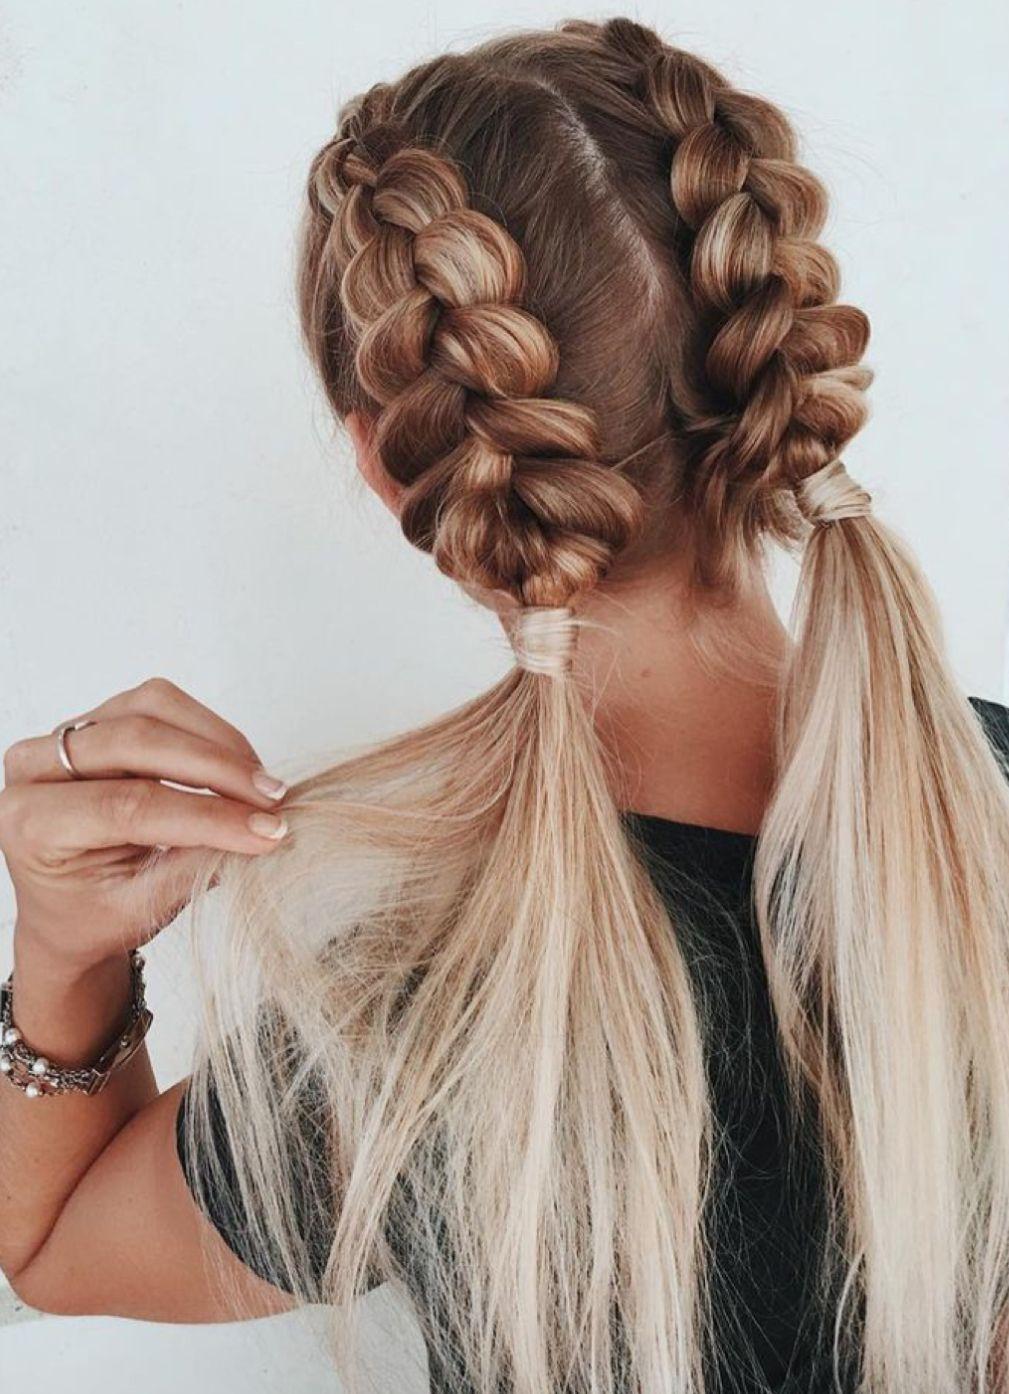 30 cute easy braided hairstyles tutorials for short hair are